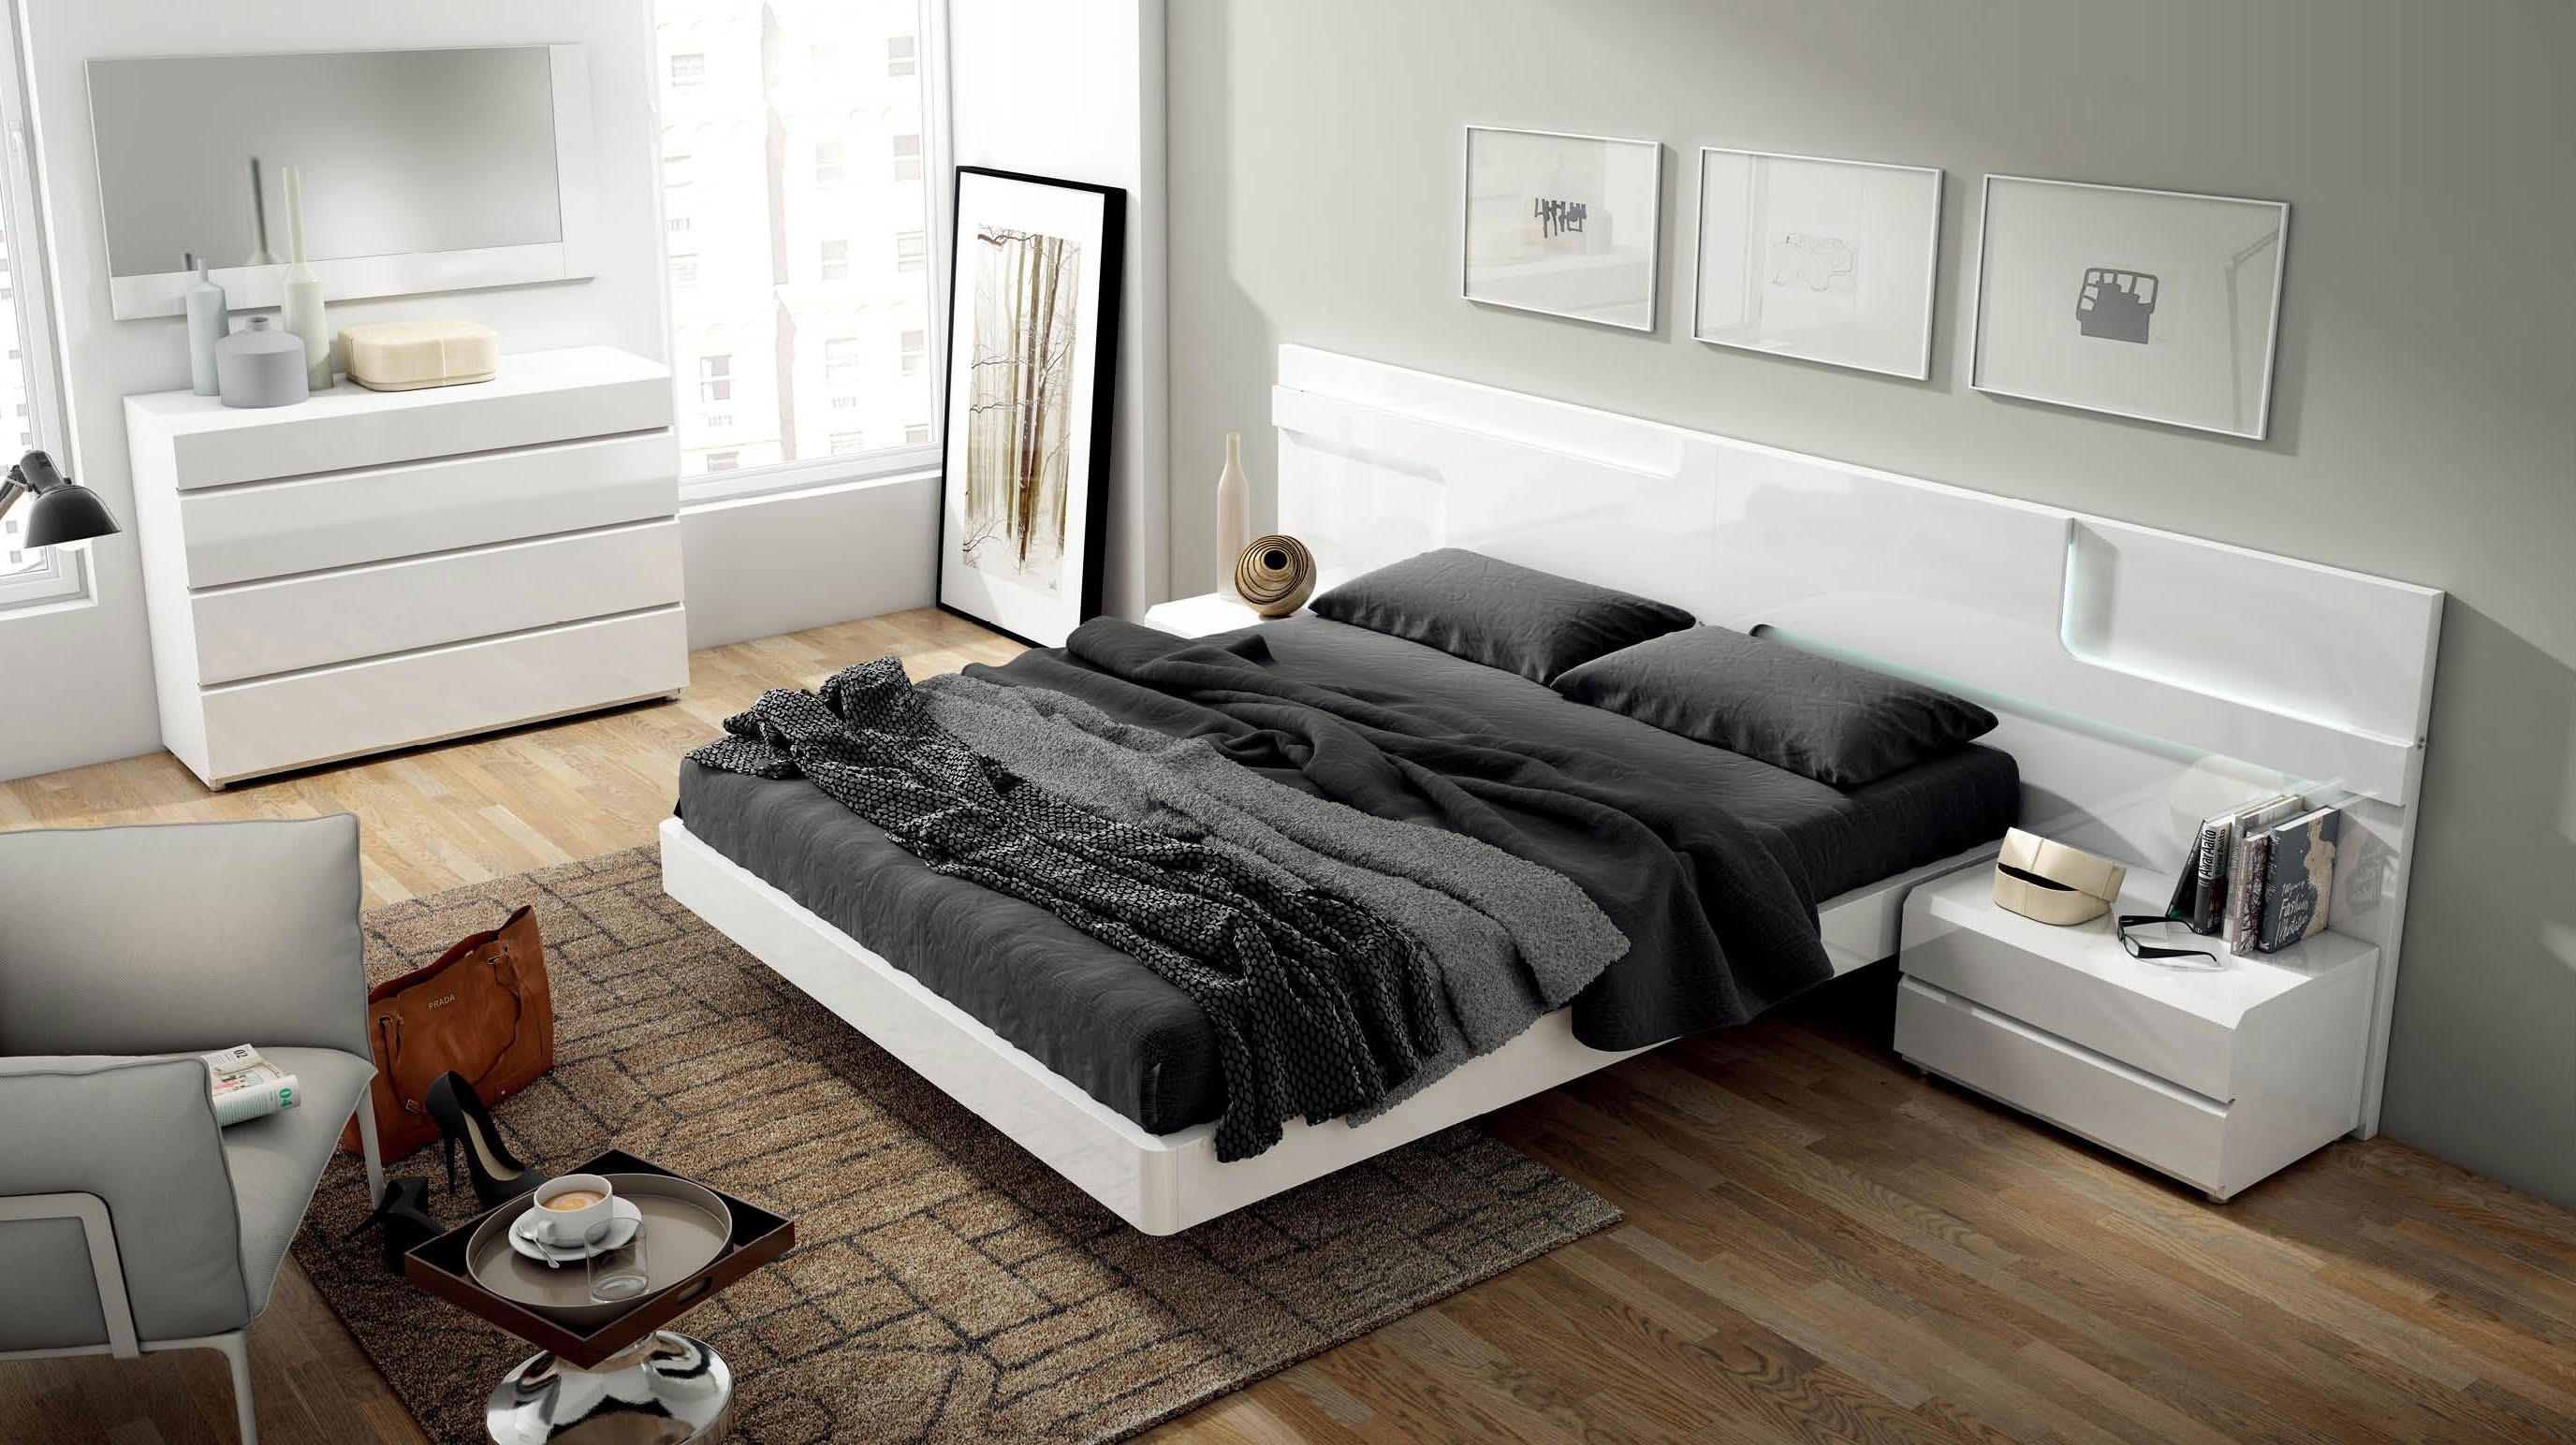 queen sofa beds clearance belham living parkville metal sectional patio dining set sara modern italian bedroom - n star furniture